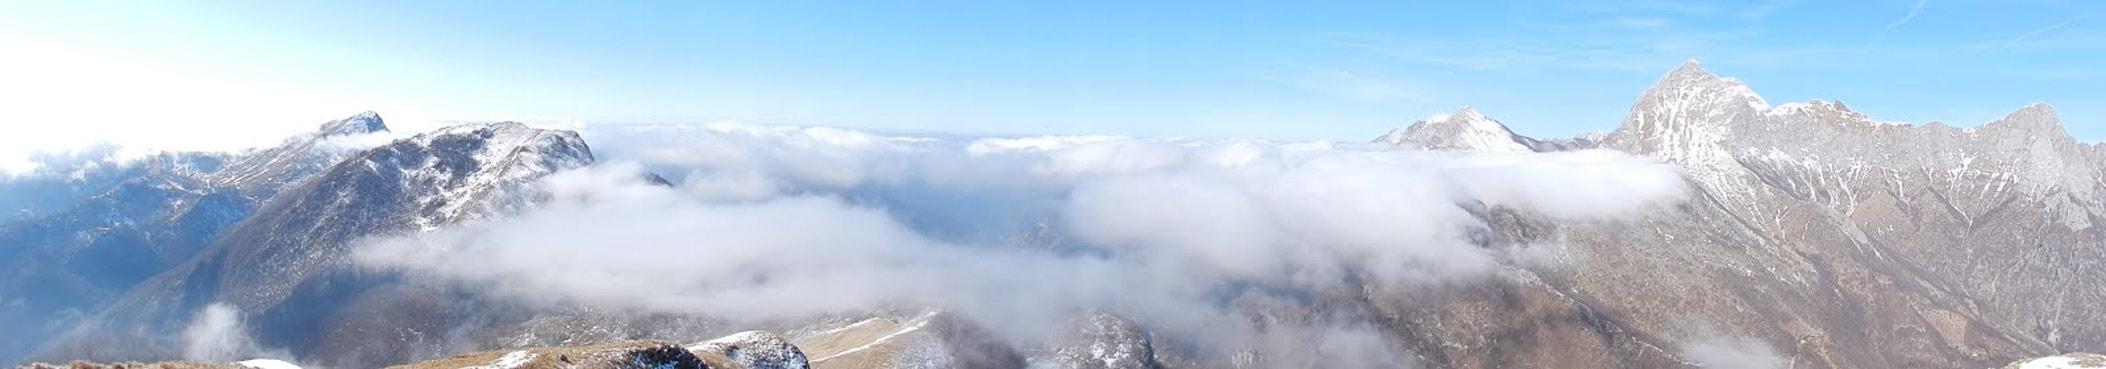 Panorama-of-the-Apuan-Alps-Daniele-Saisi